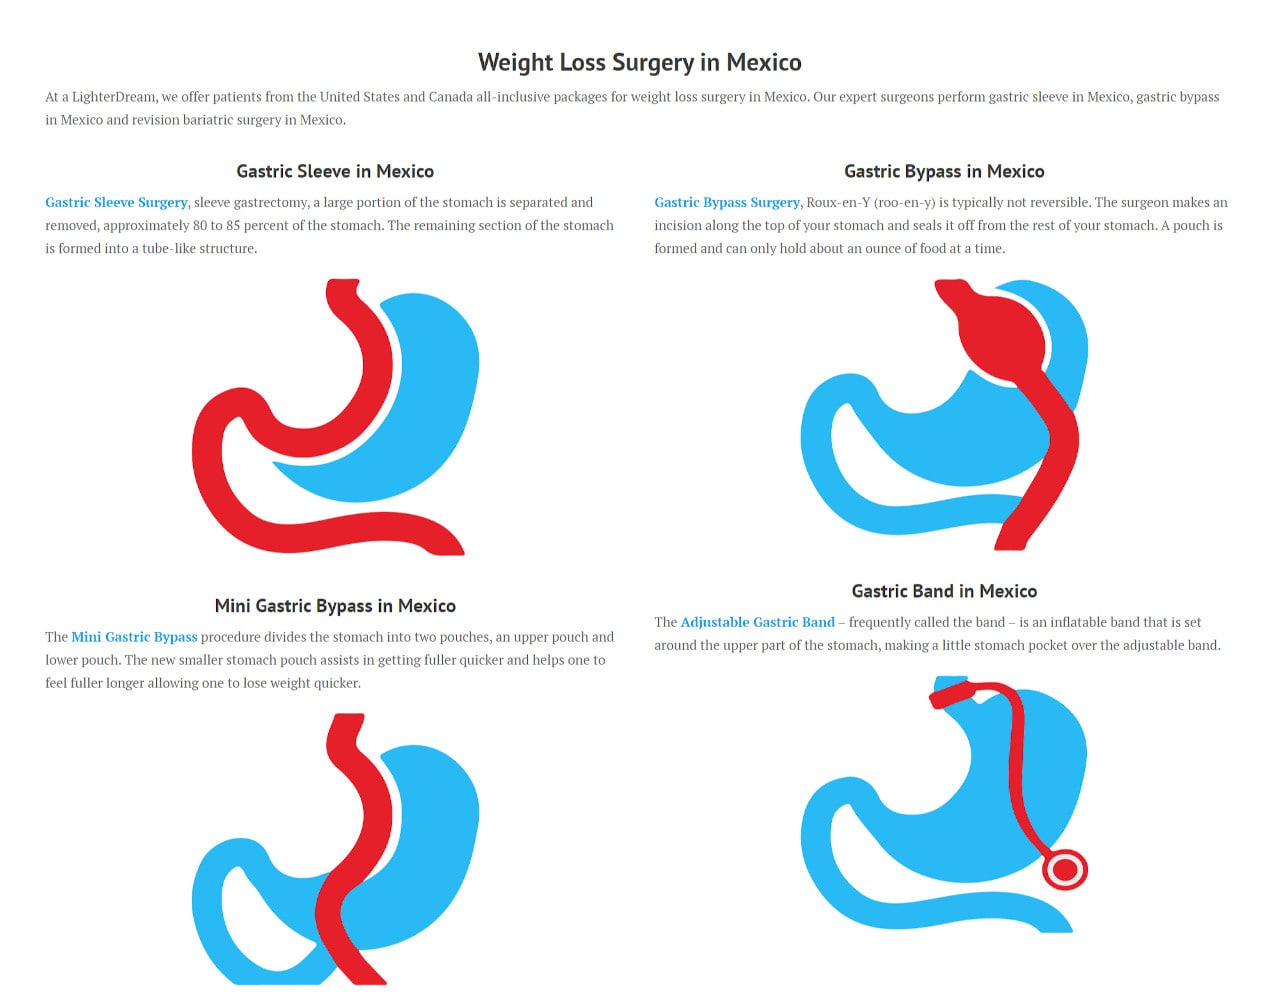 Lighter Dream Bariatrics - Bariatric Surgery Procedures in Tijuana, Mexico